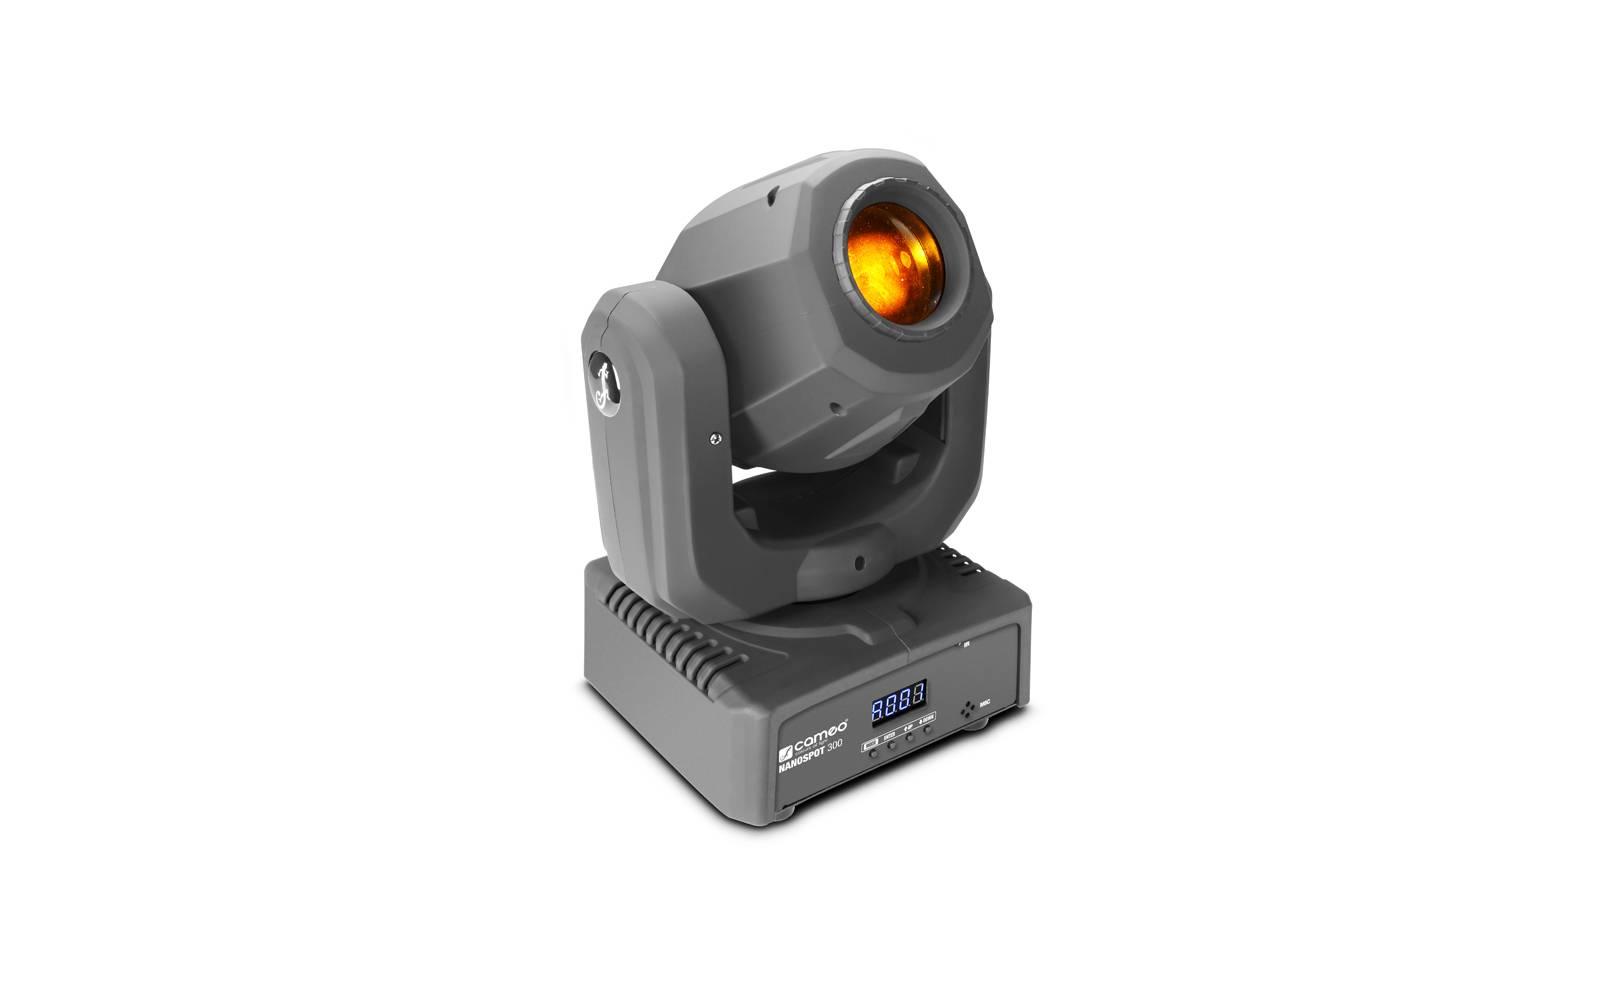 cameo-nanospot-300-led-mini-moving-head-30-w